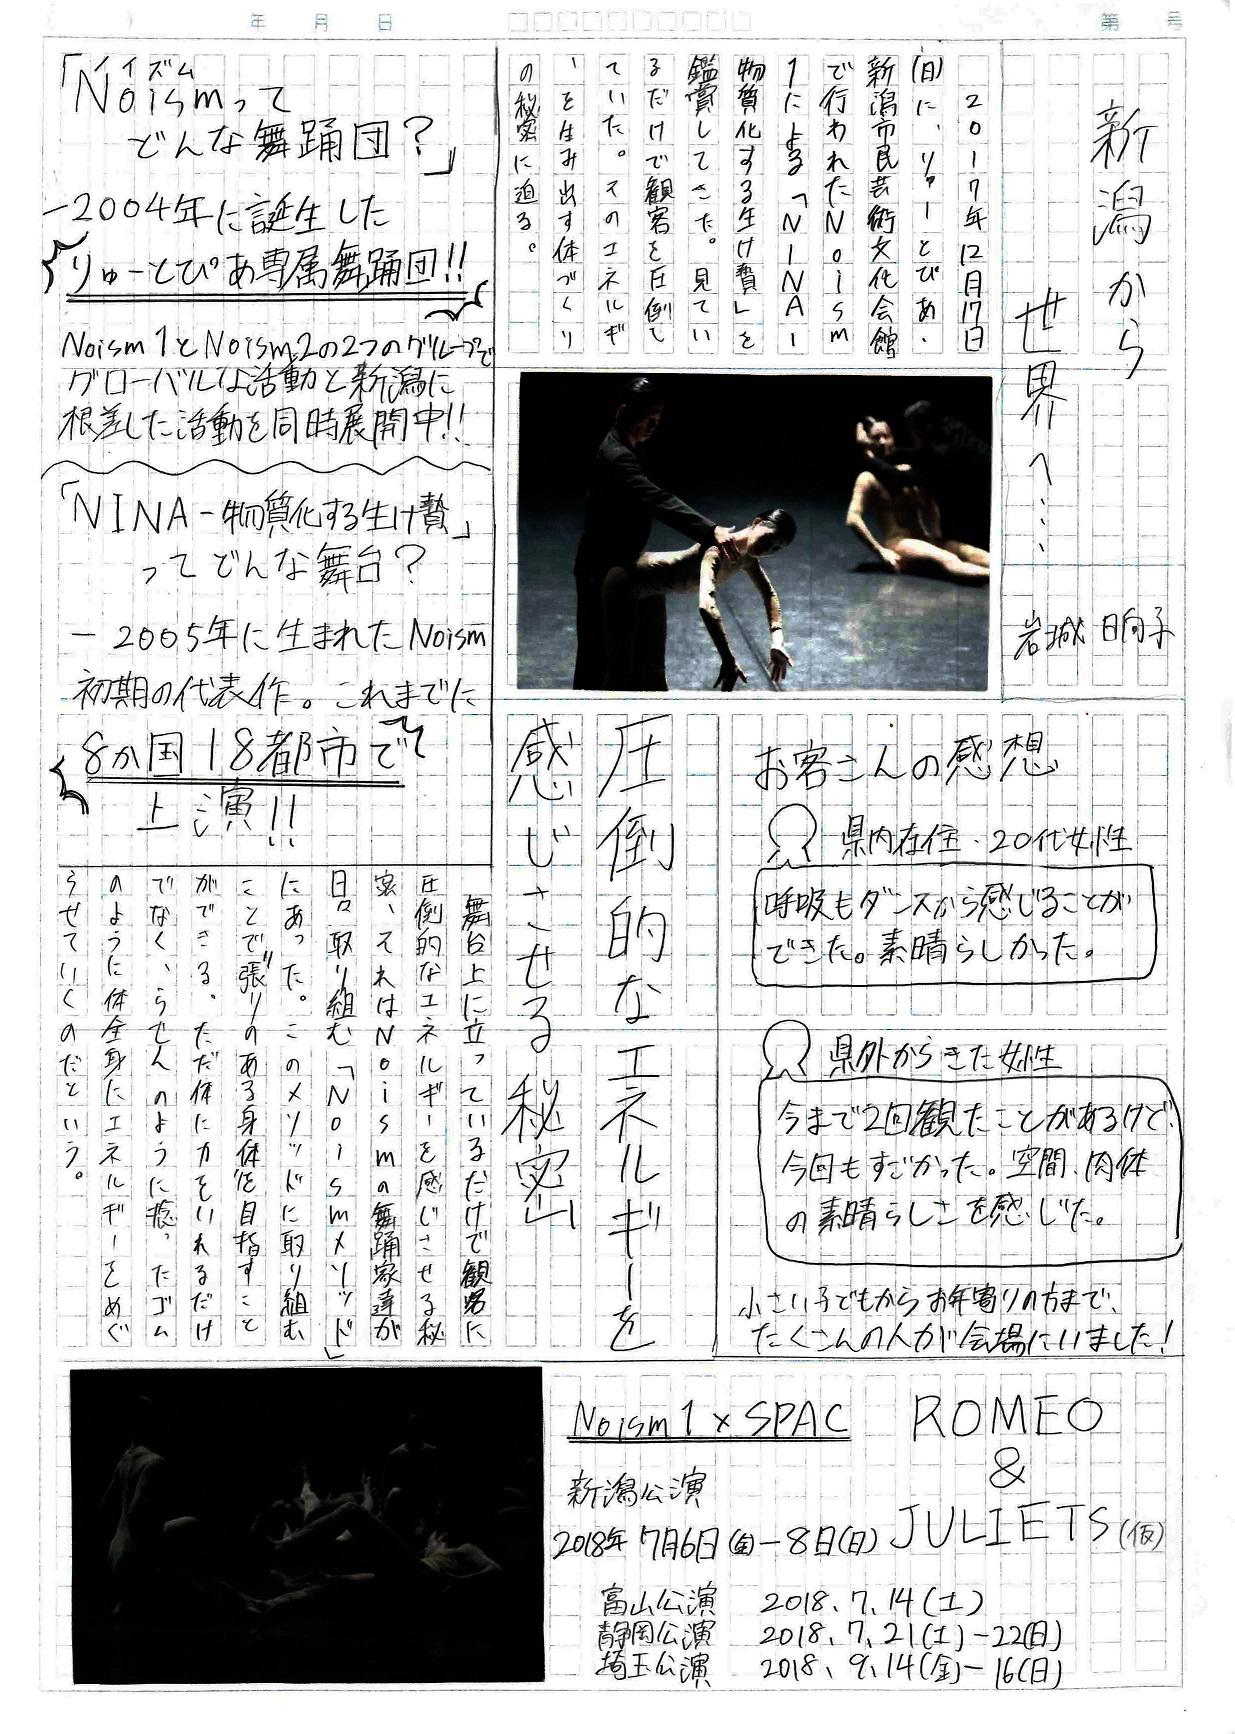 http://bunp.47news.jp/event/images/niigatasekai_iwaki1801.jpg